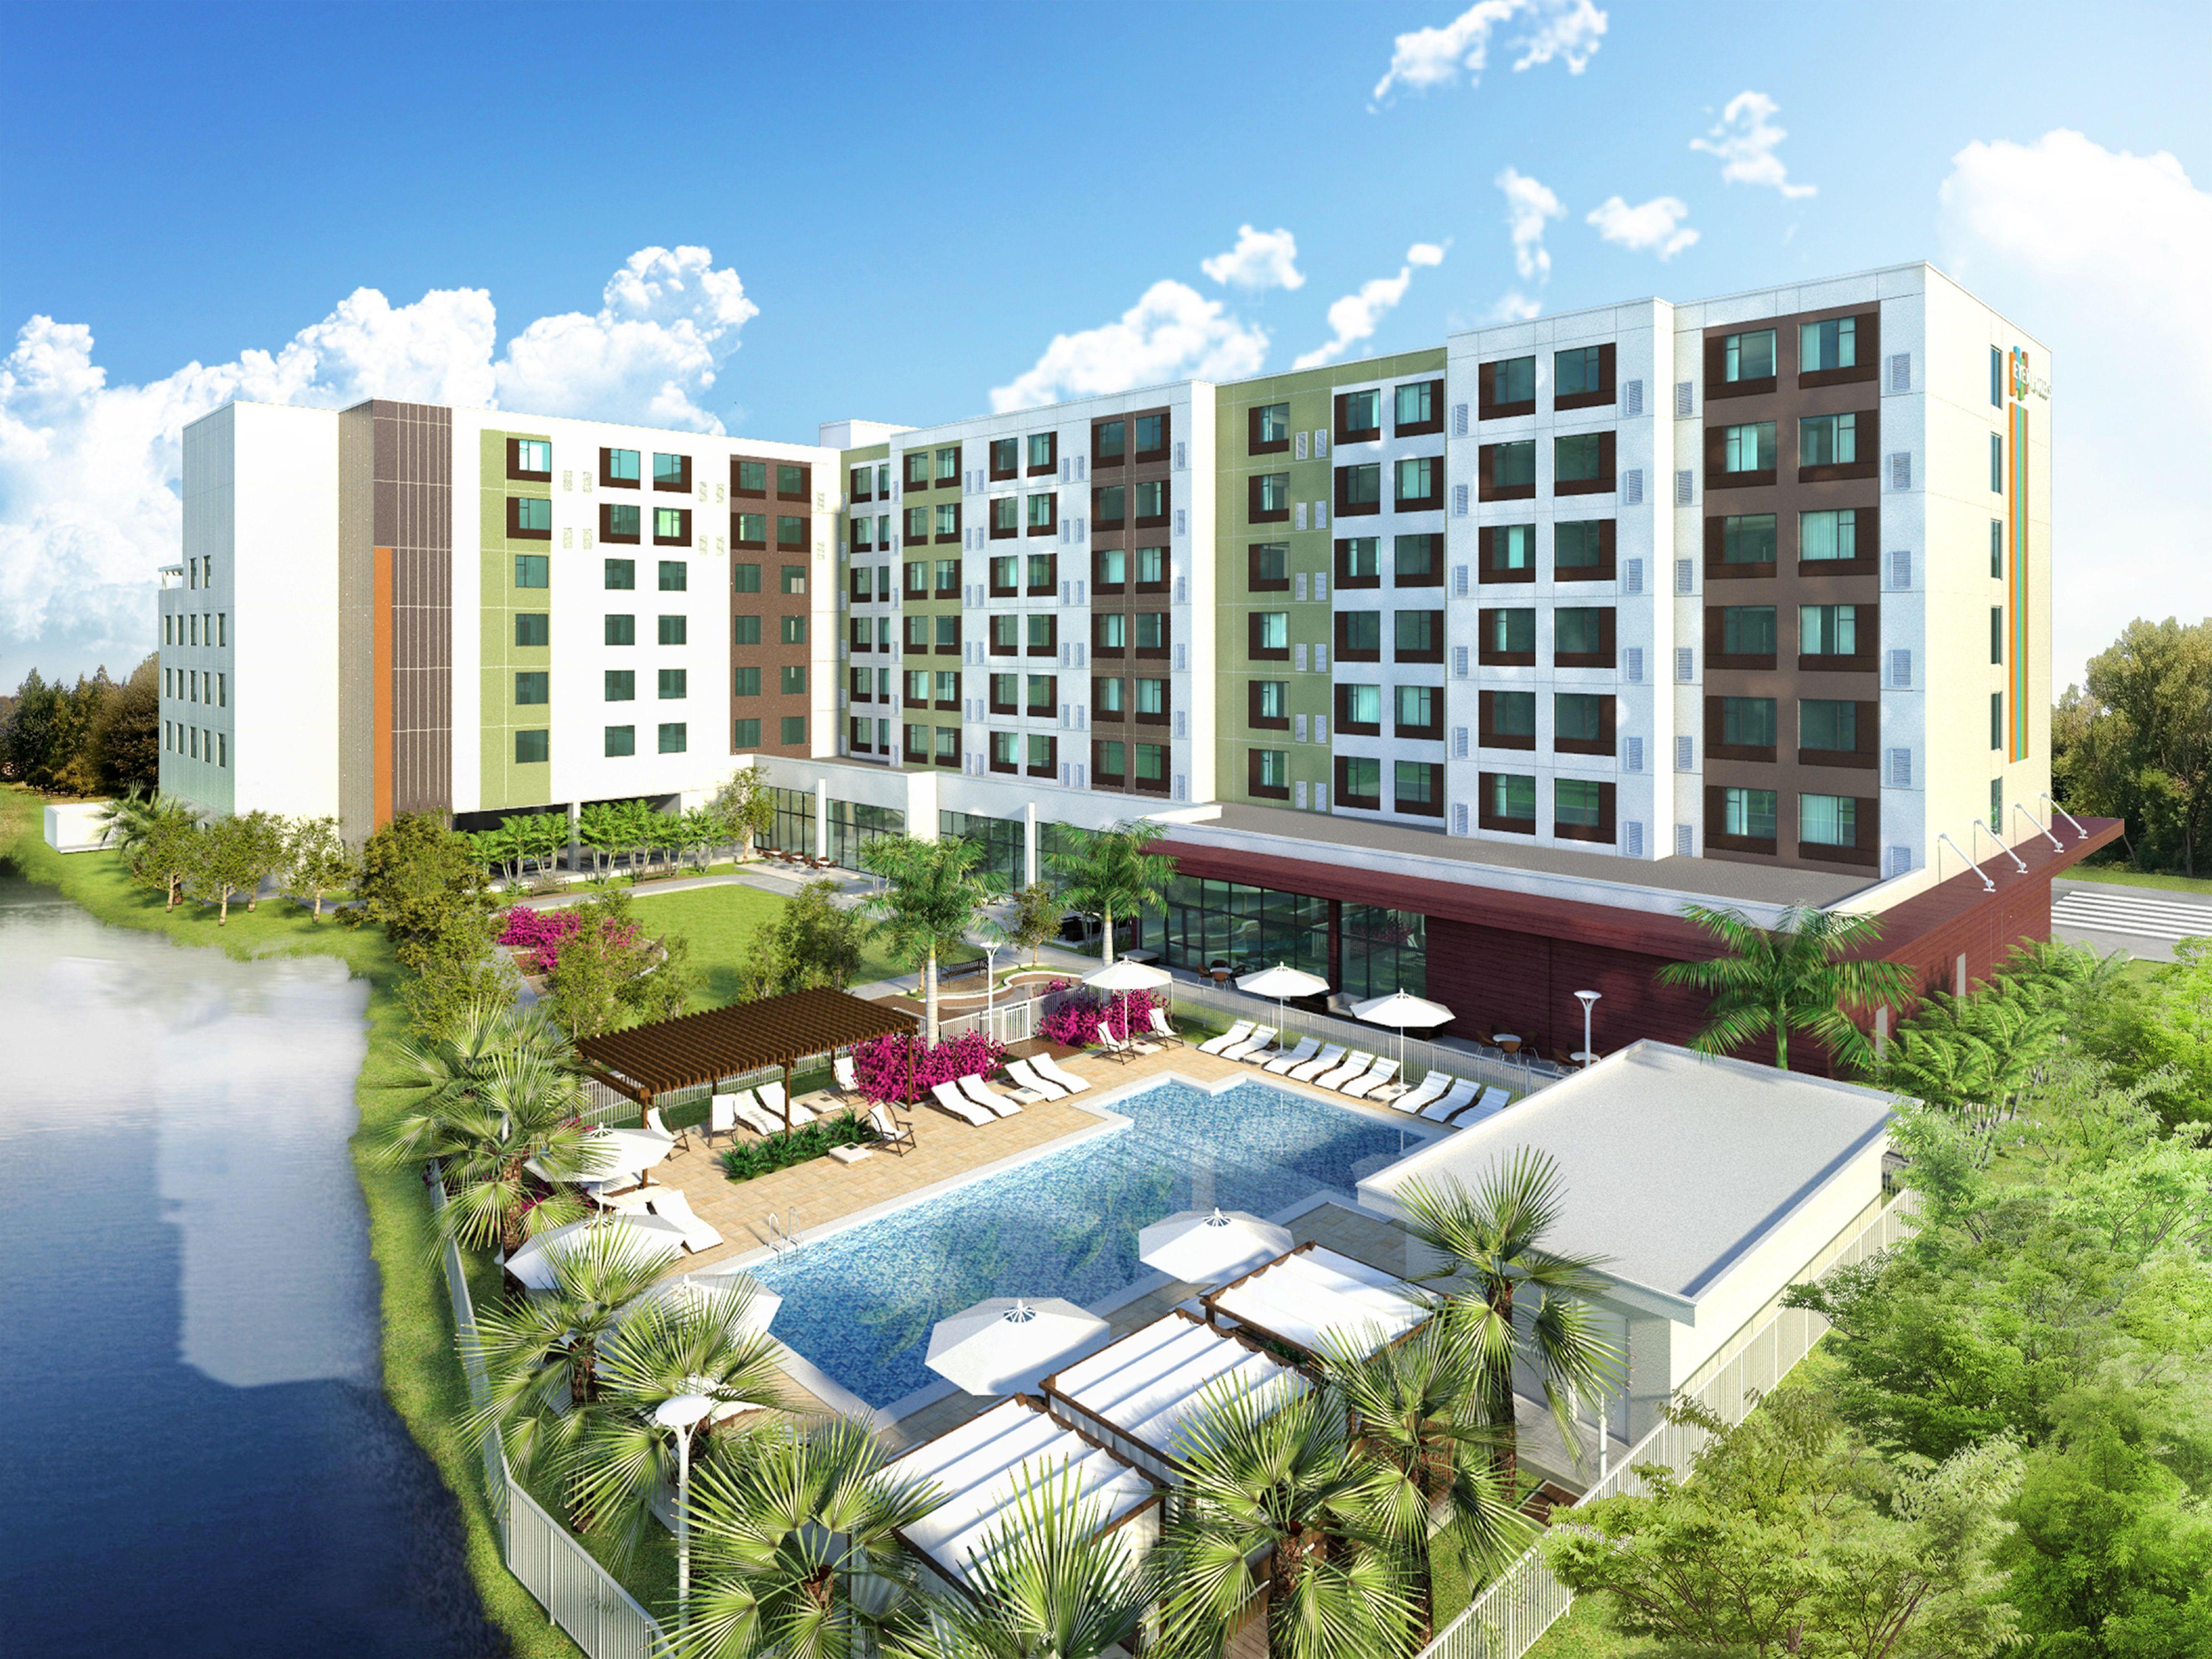 mbc inn fl beach miami at garden bwd hilton south events the hgi hotels gardens index extdusk in cheap stay